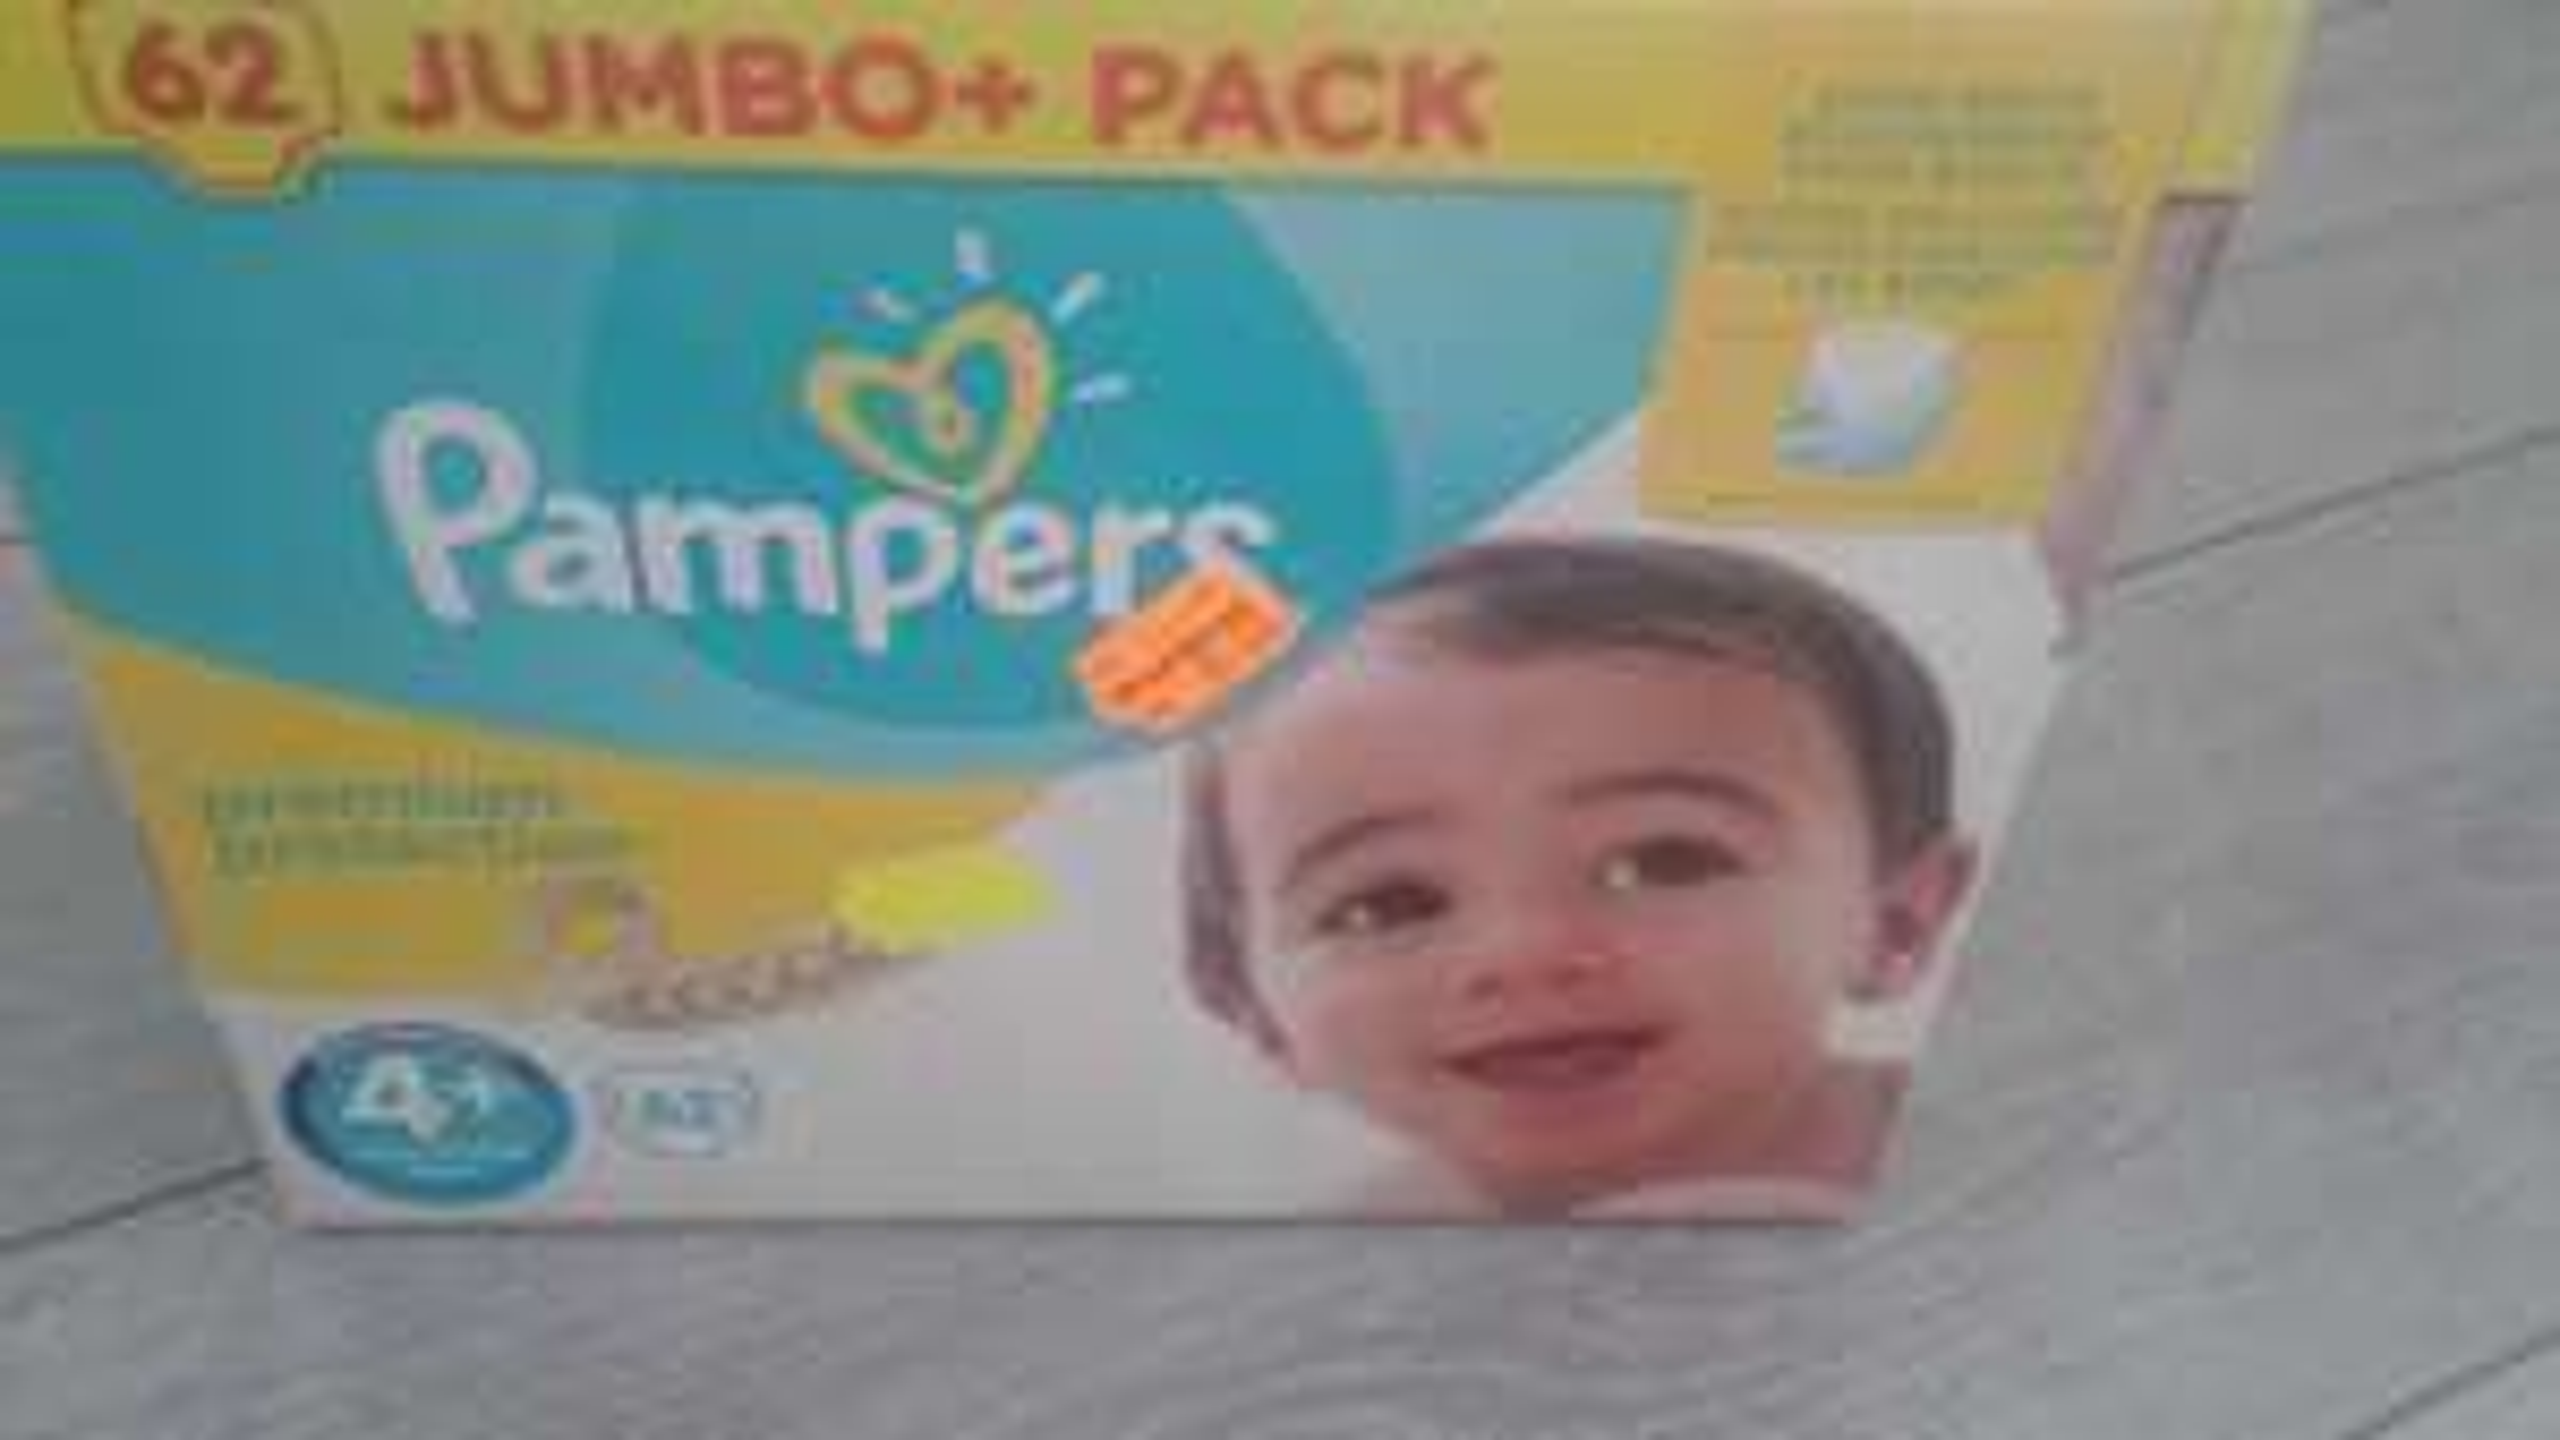 Pampers jumbo+pack 50% korting bij kruidvat